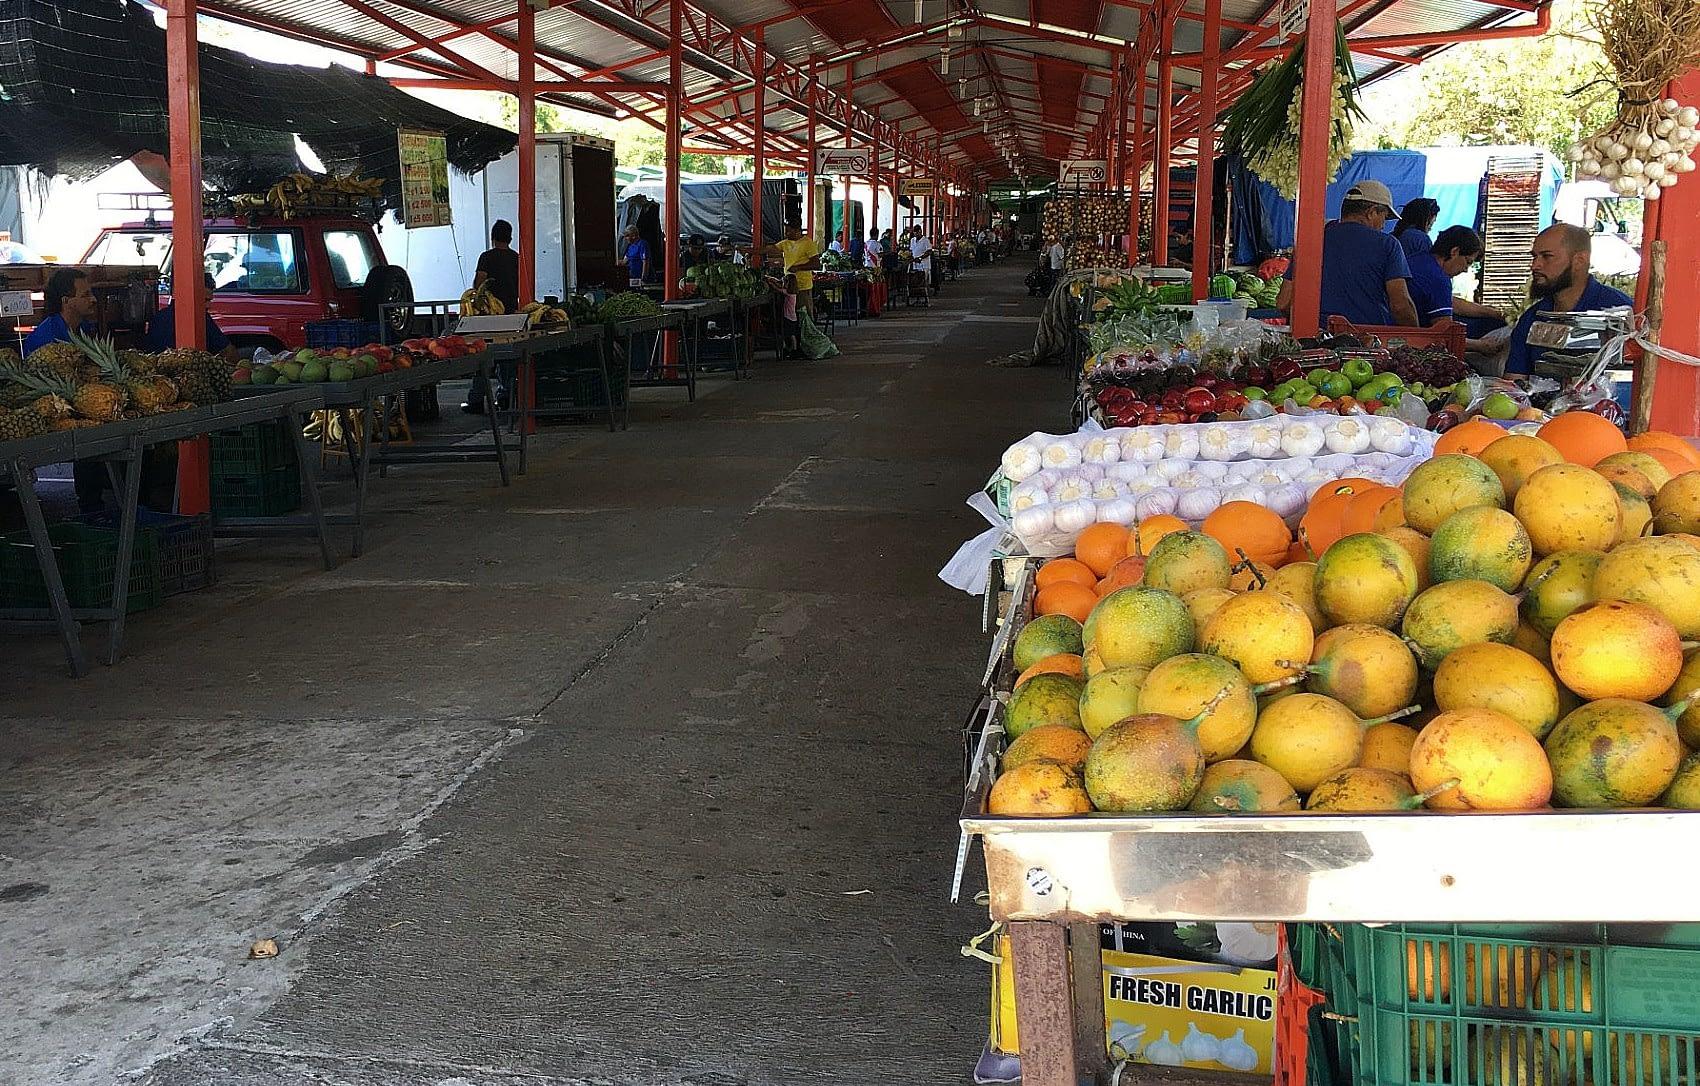 feria or farmers market